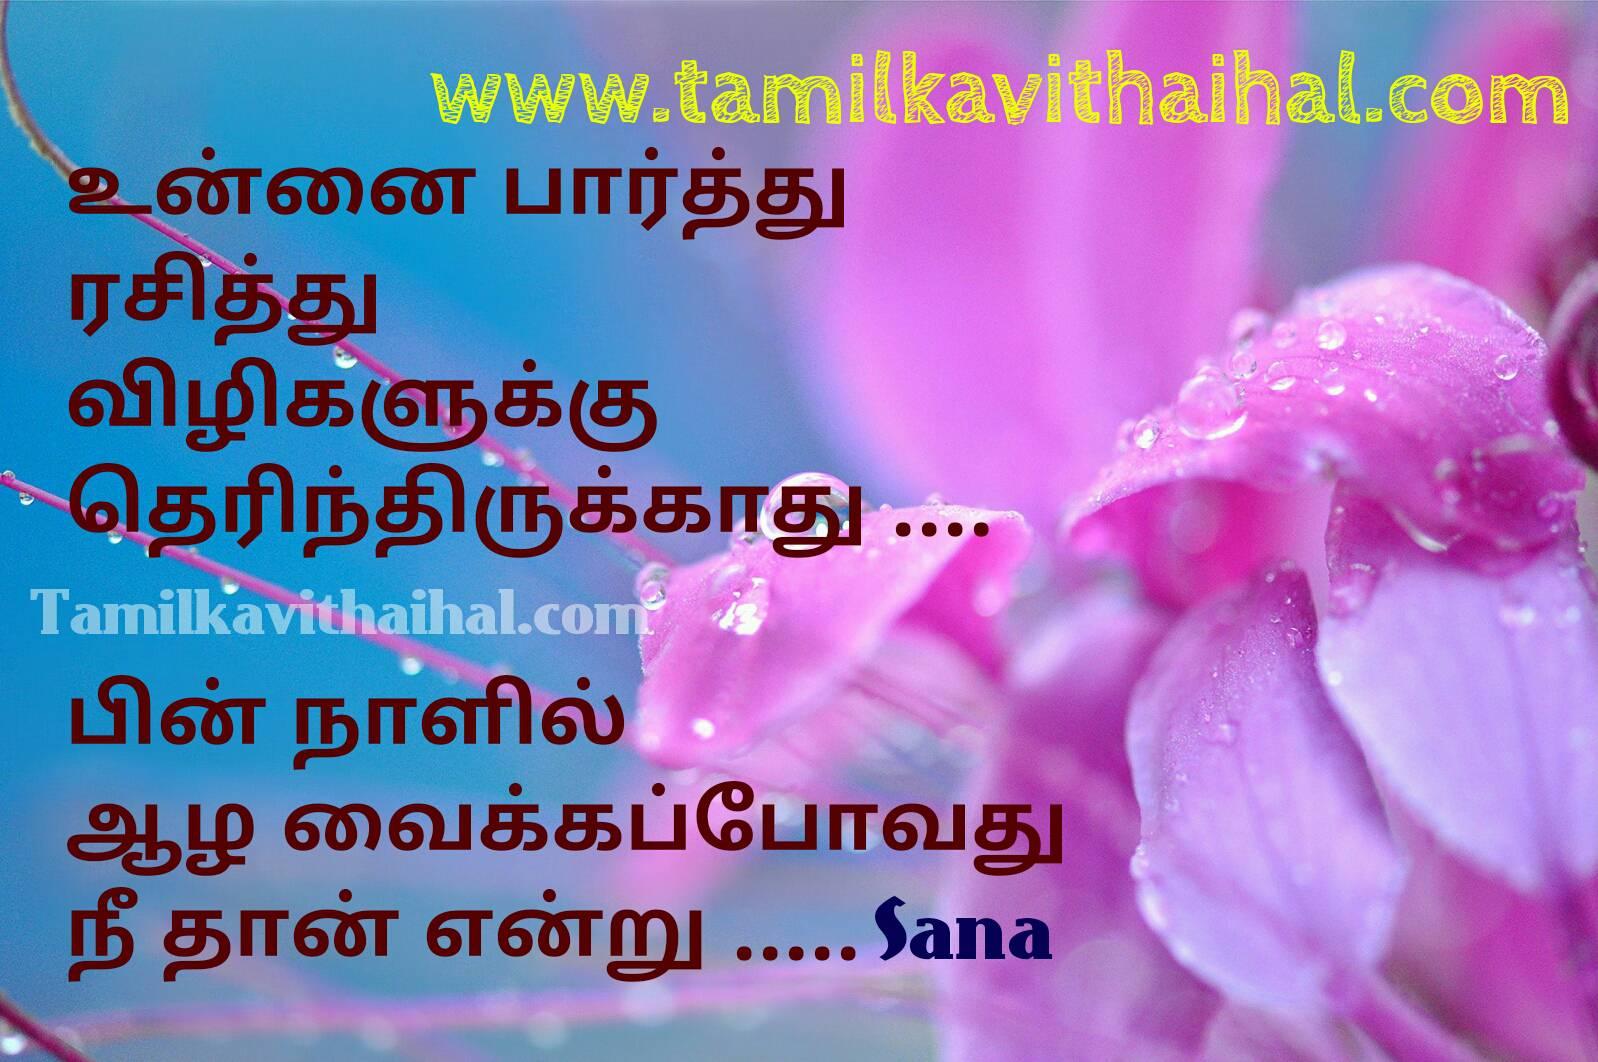 Love failure whatsapp quotes in tamil sogamana kadhal kanner kavithai sana image